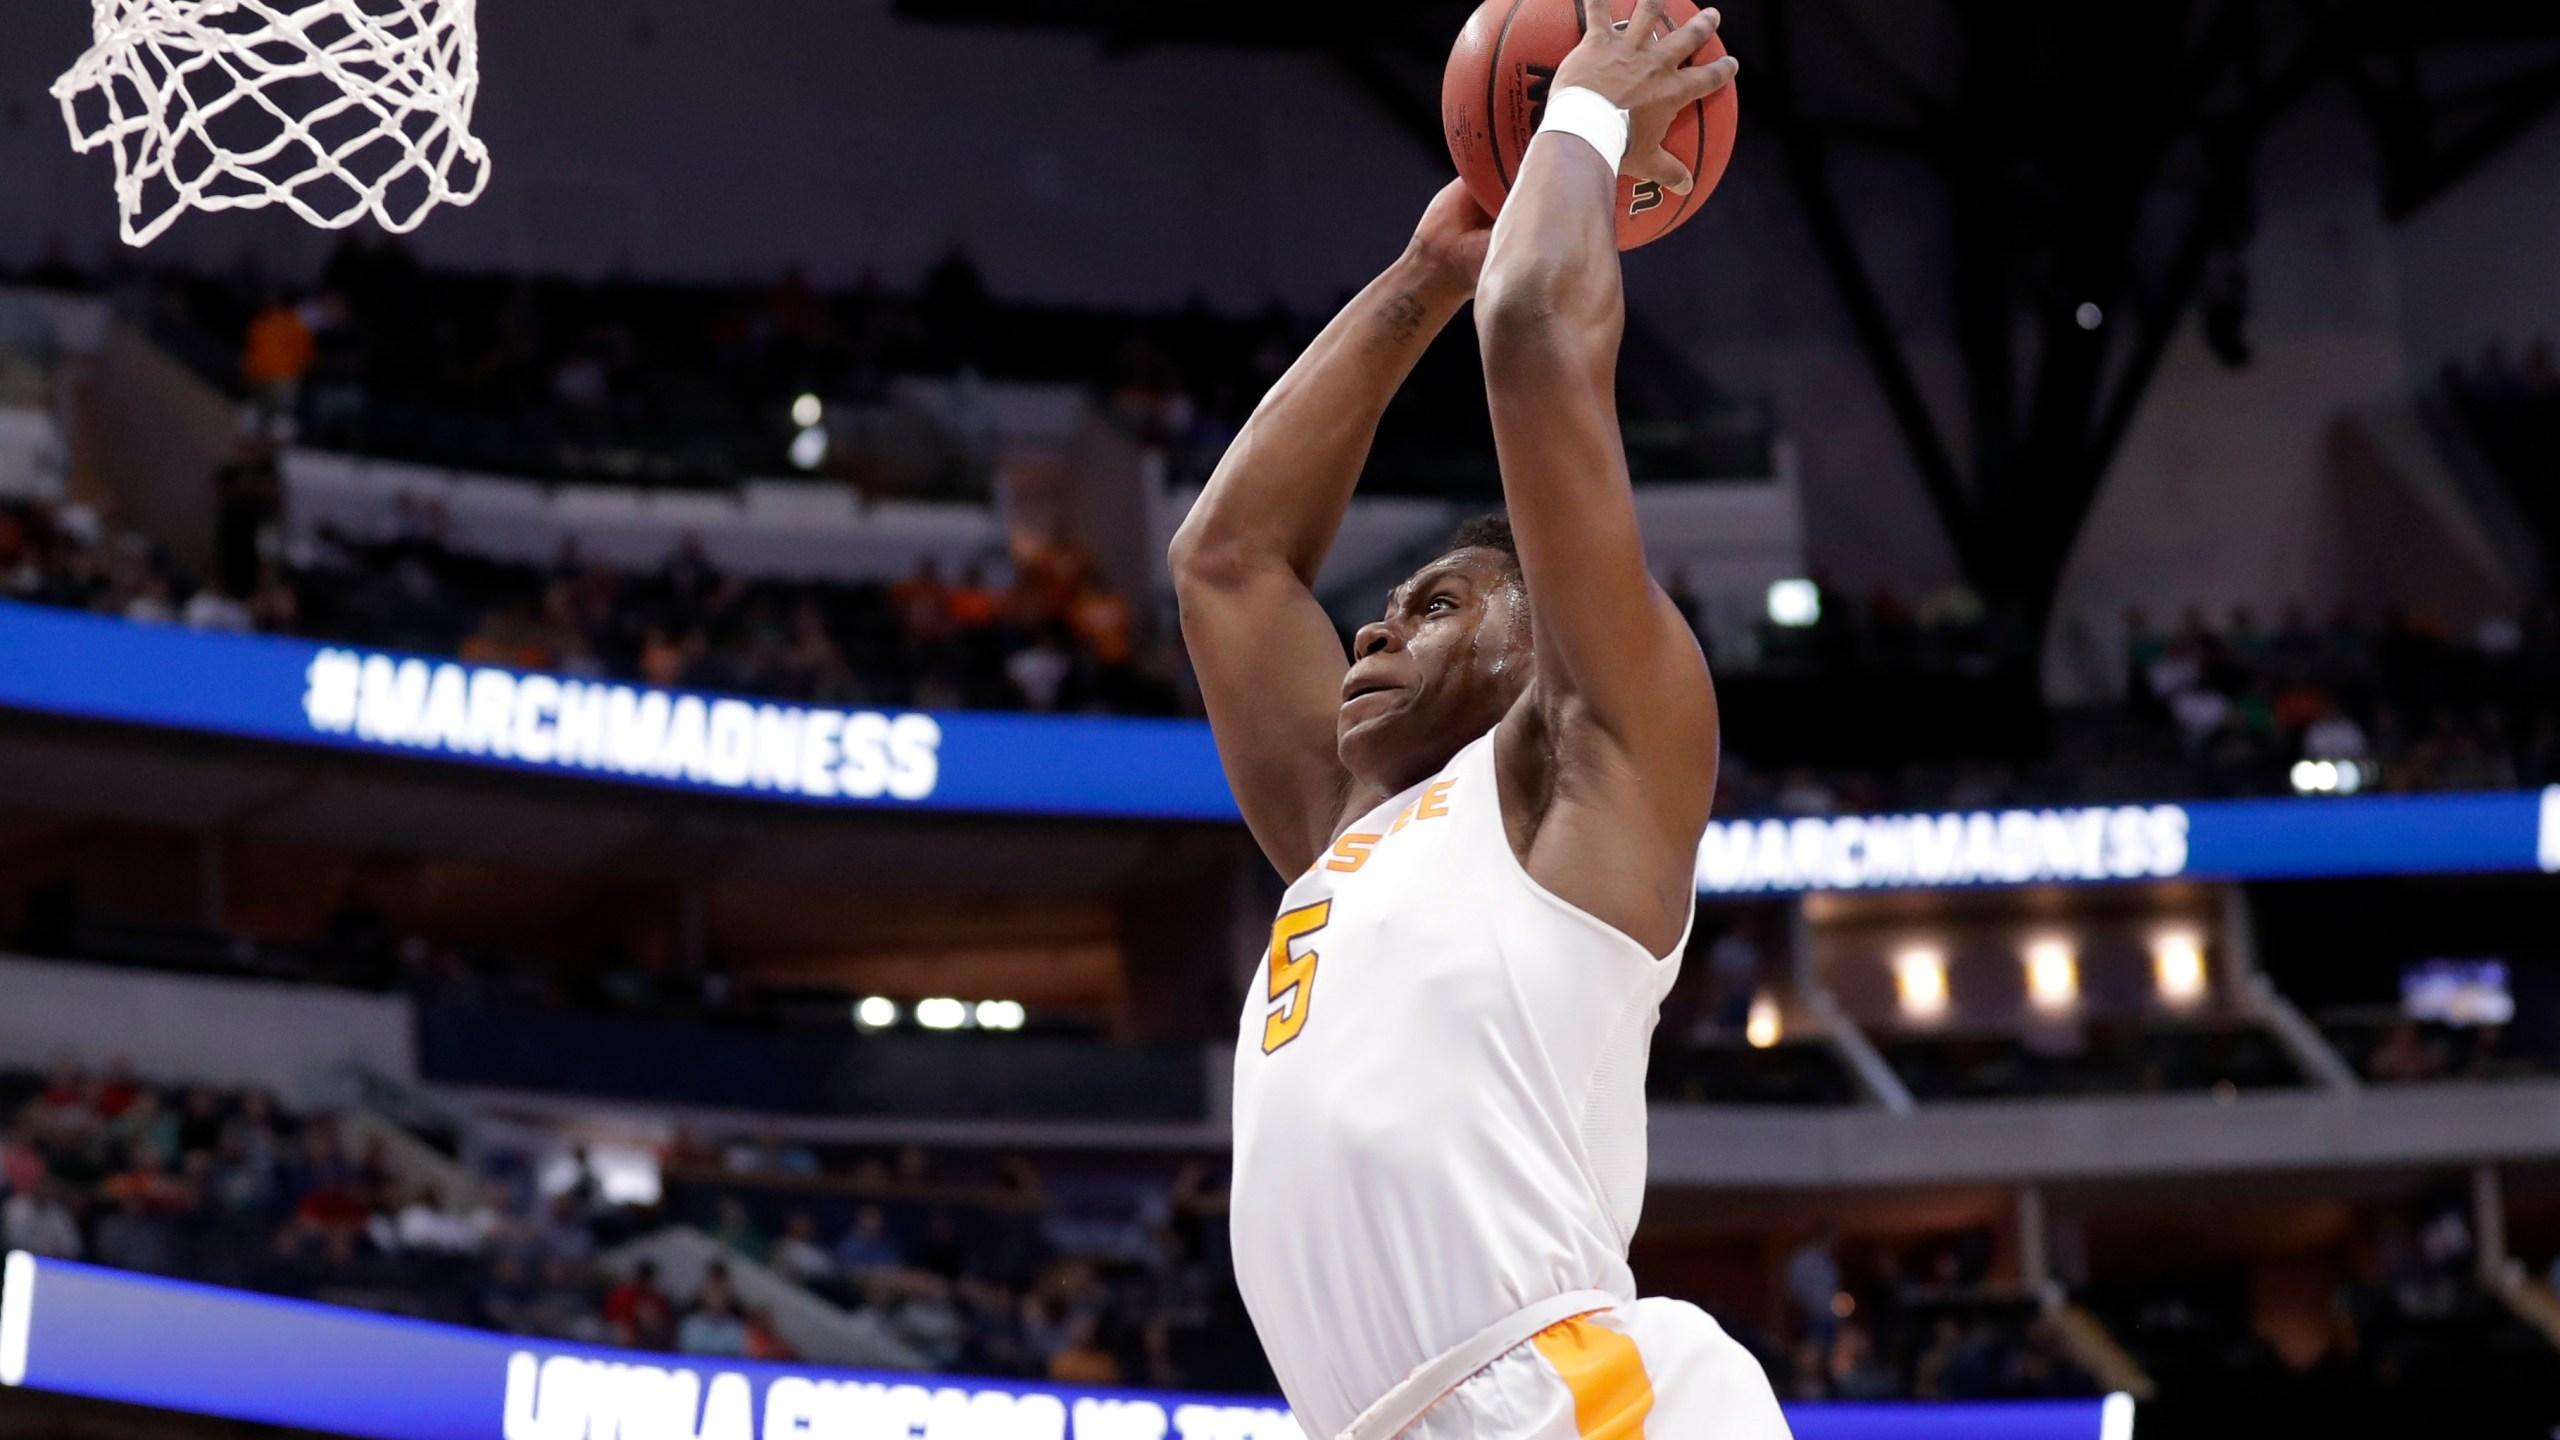 NCAA Loyola Chicago Tennessee Basketball_1522370456061